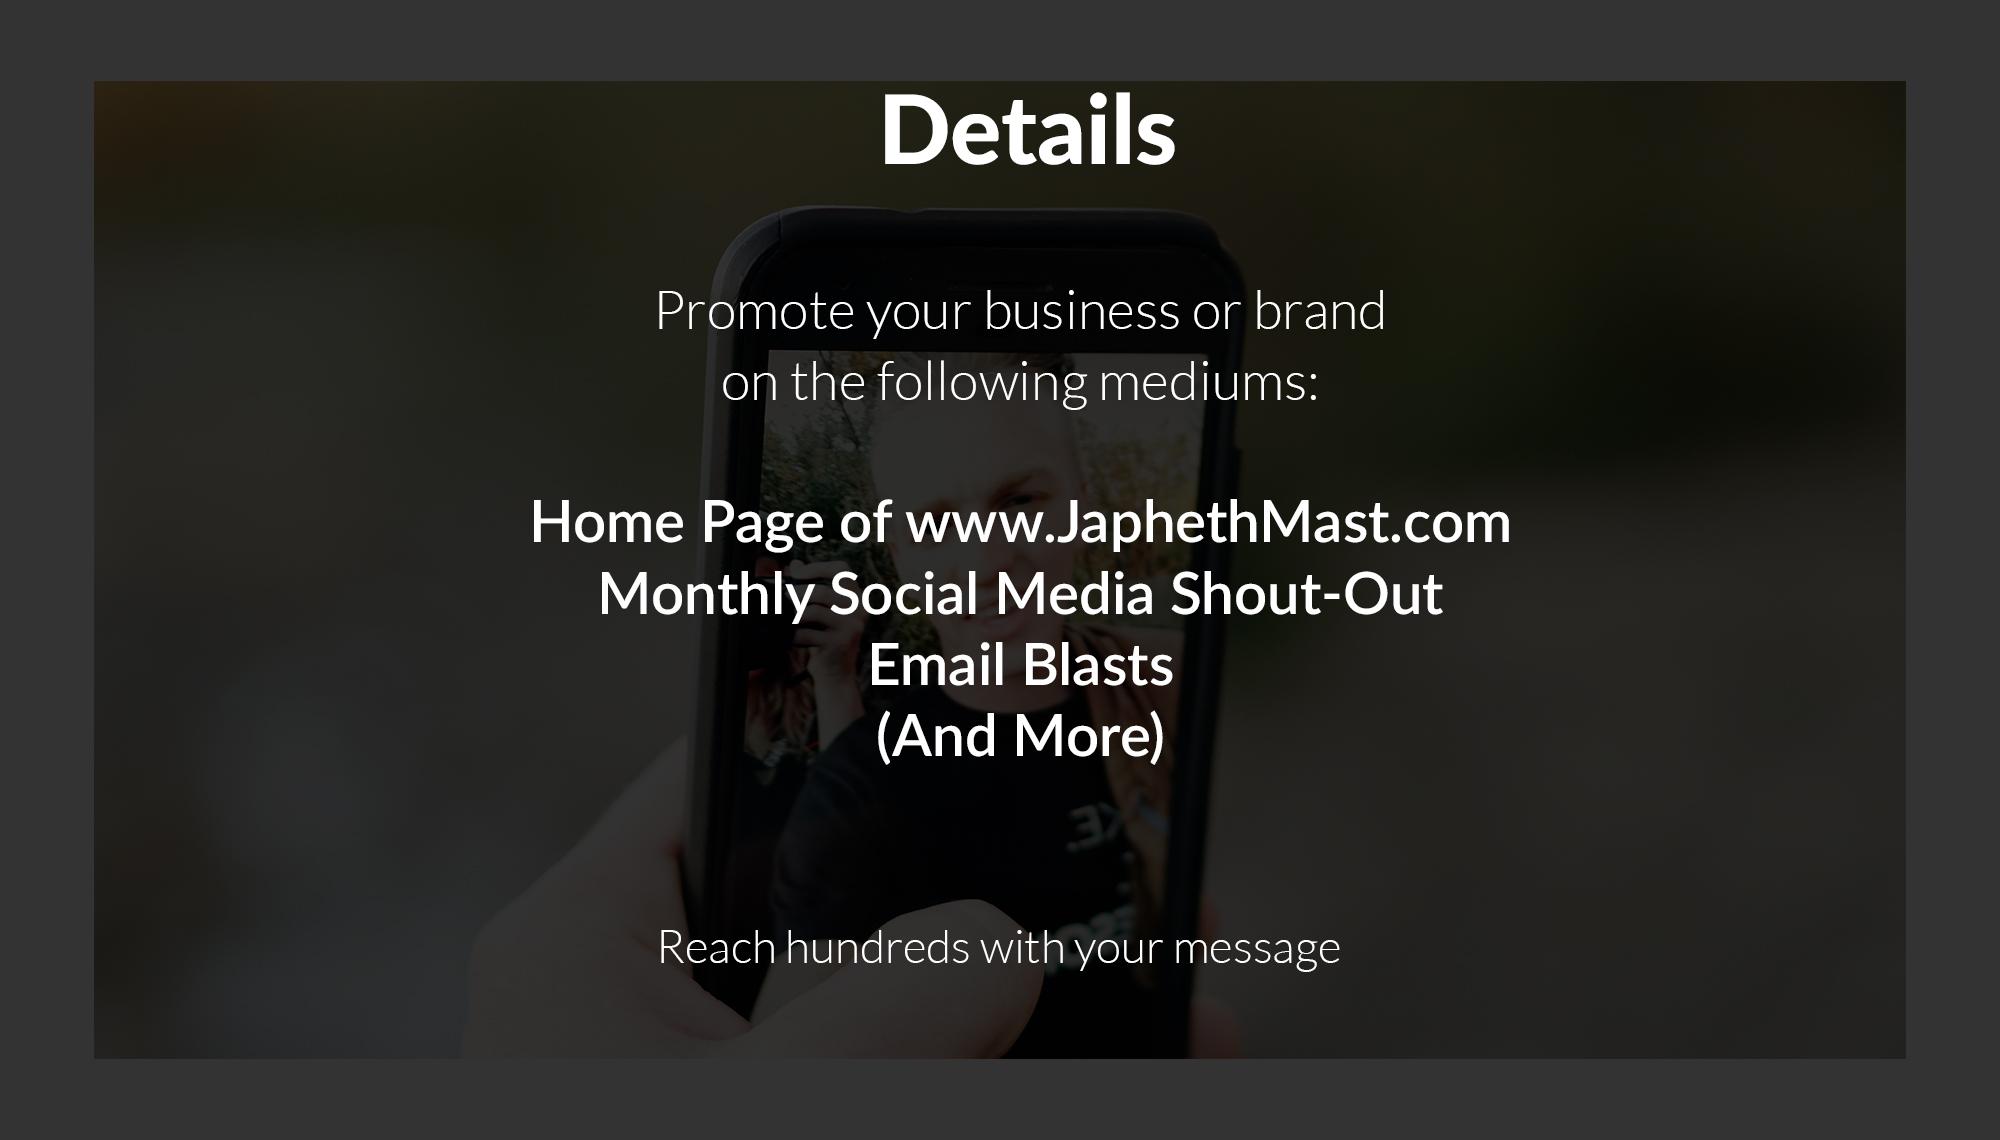 Japheth Mast Blog Sponsorship - Brand, Business, and Product Promotion